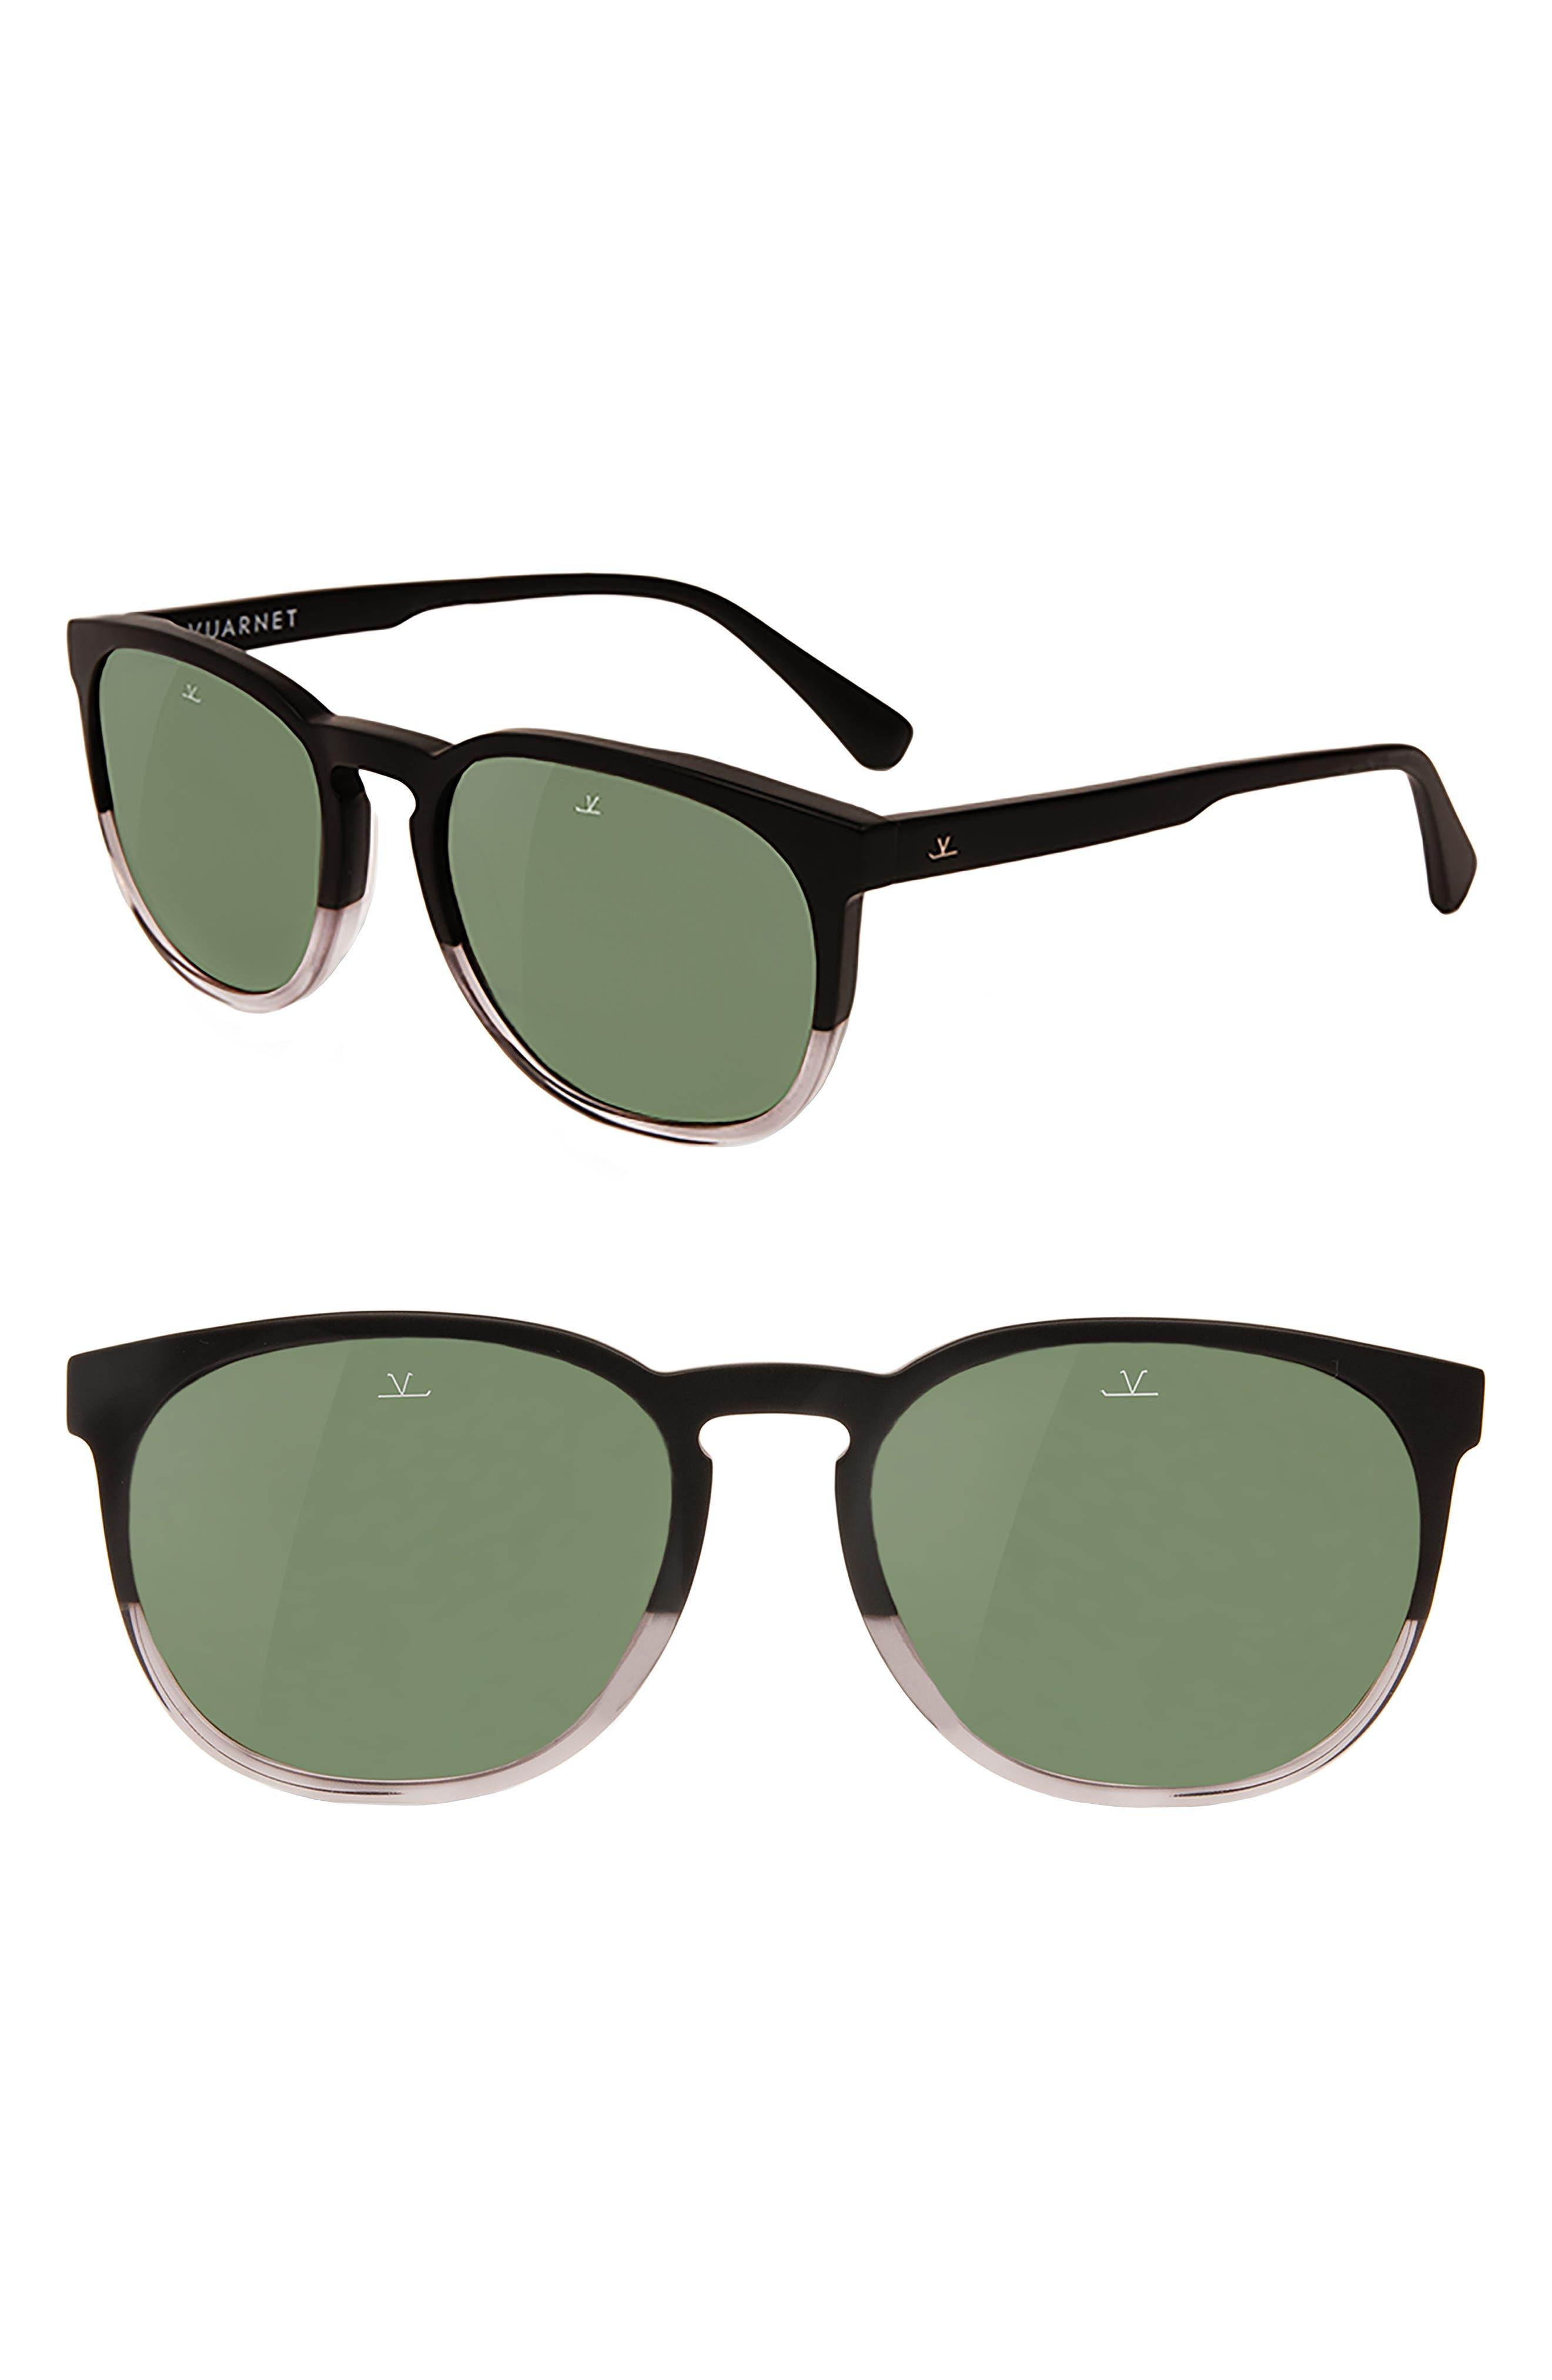 District 54mm Sunglasses,                             Main thumbnail 1, color,                             MATT BLACK / SHINY TRANSPARENT